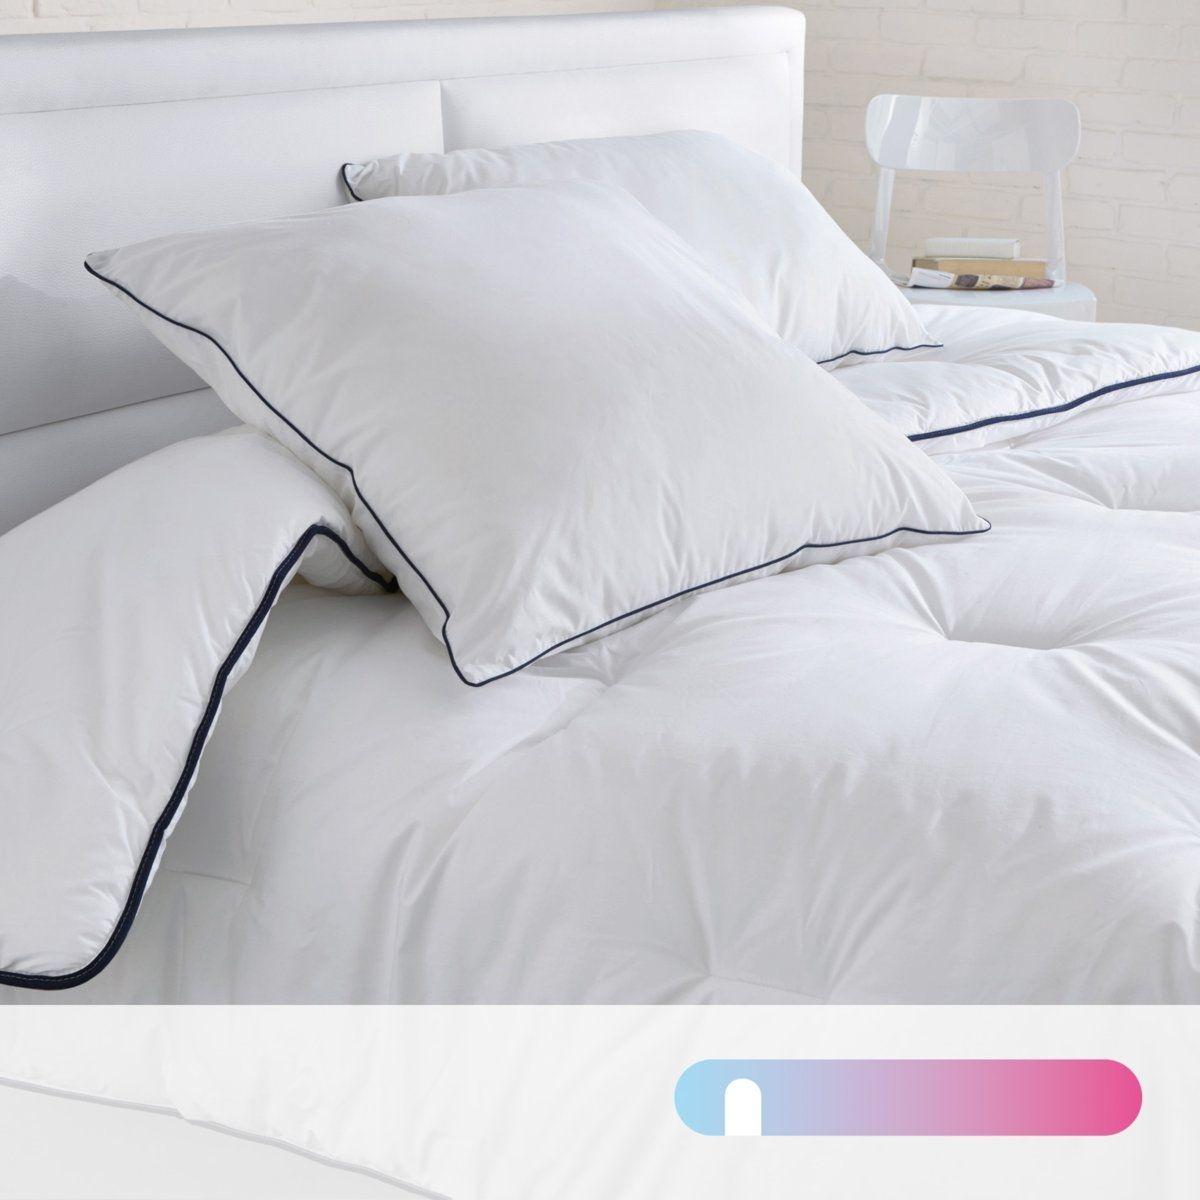 Couette polyester 200g/m2, traitée anti acariens